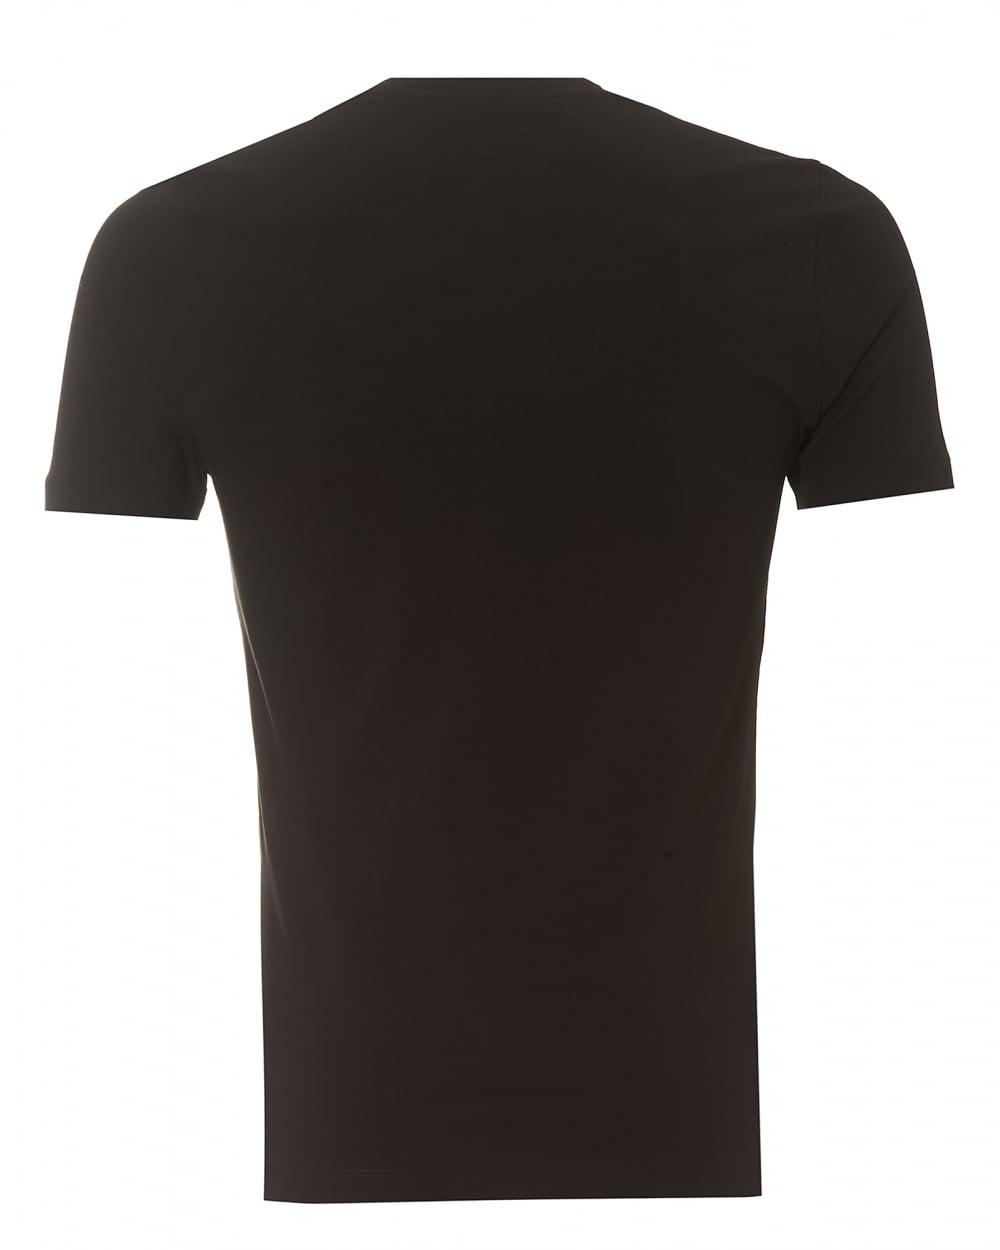 Love Moschino Mens Plain Badge T-Shirt 632452b6c91